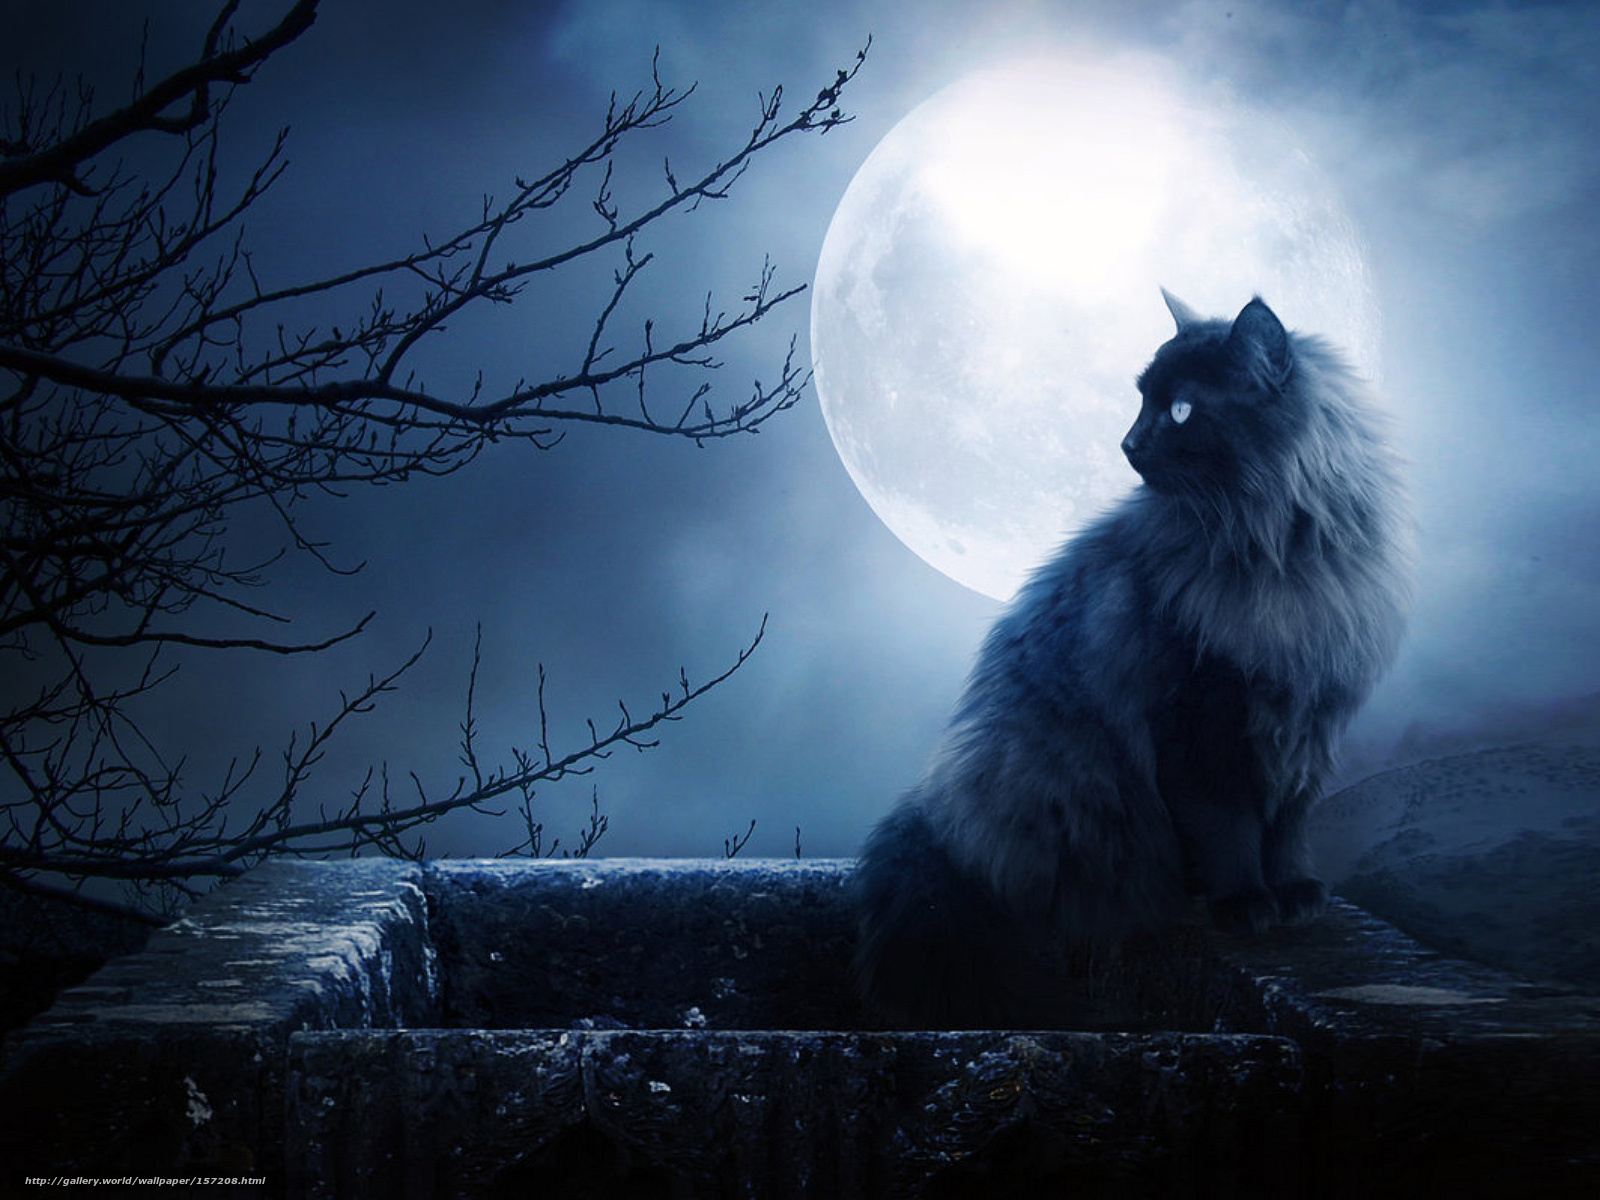 луна кот обои на рабочий стол № 573623 бесплатно